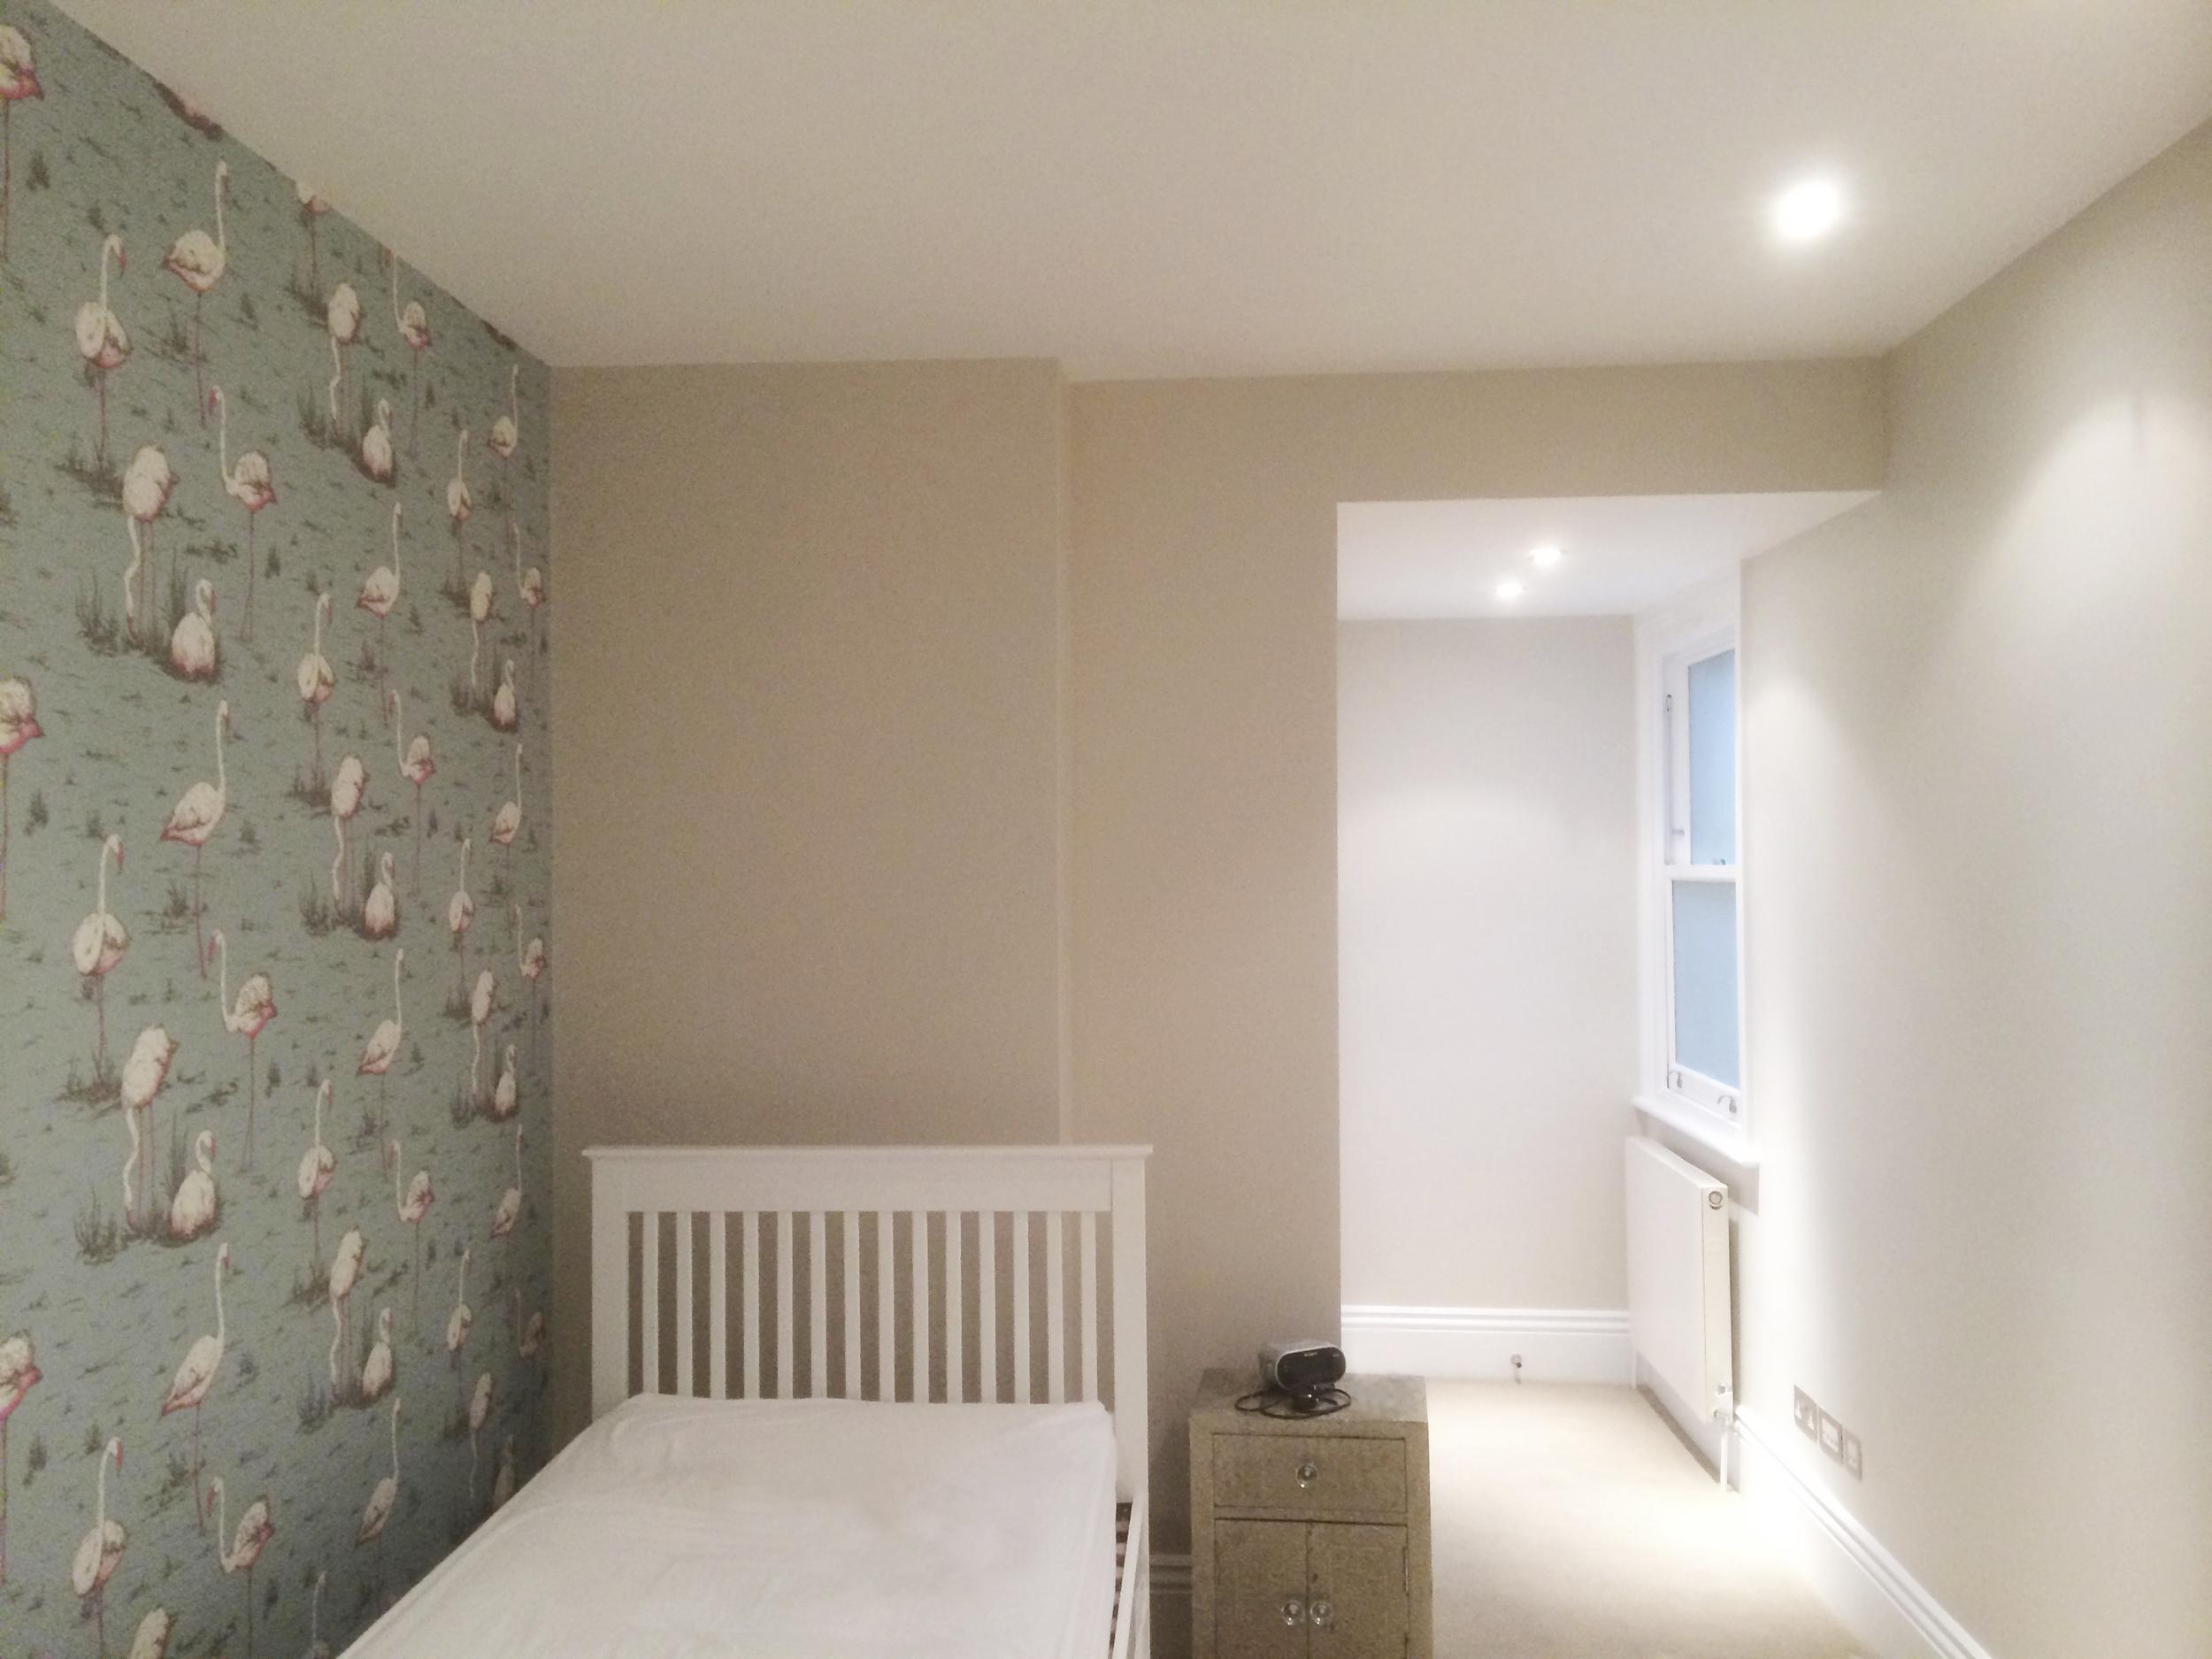 #NHRenovations #Painter #Decorator #London #PrimroseHill #Windows #Farrowandball #Farrow #Allwhite #LauraAshley #Wallpaper #Flamingos